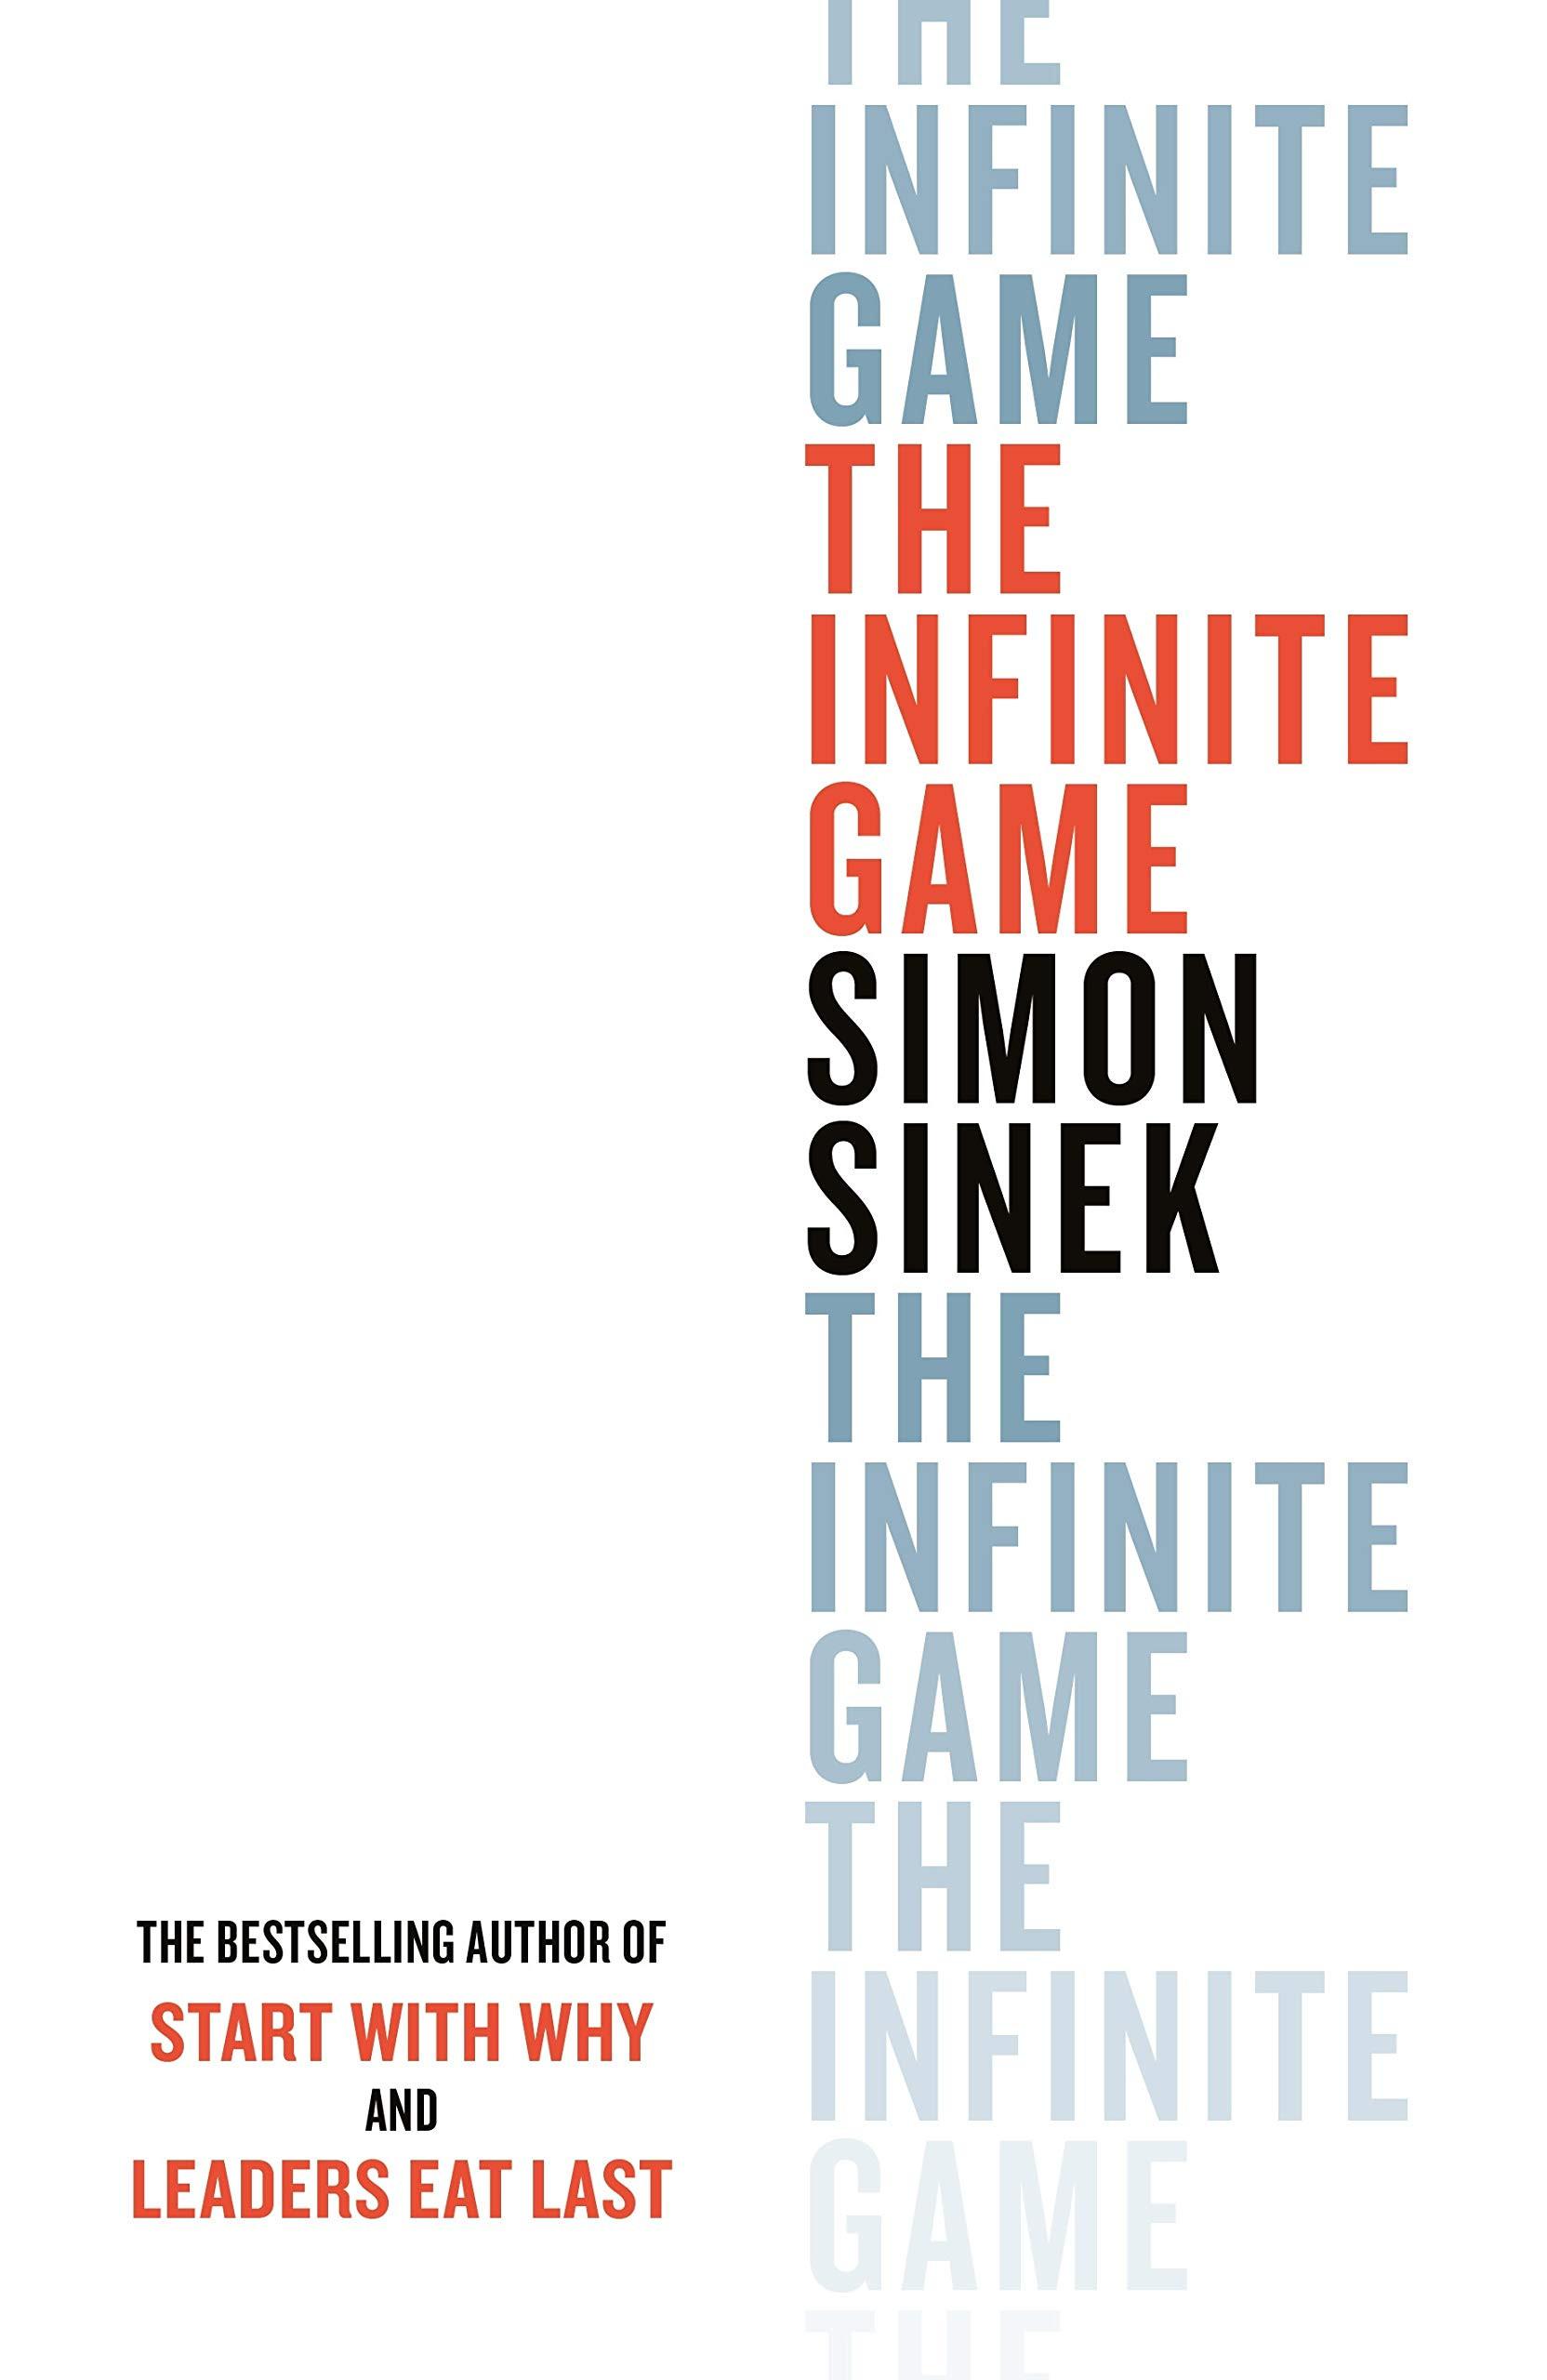 Simon Sinek - The Infinite Game